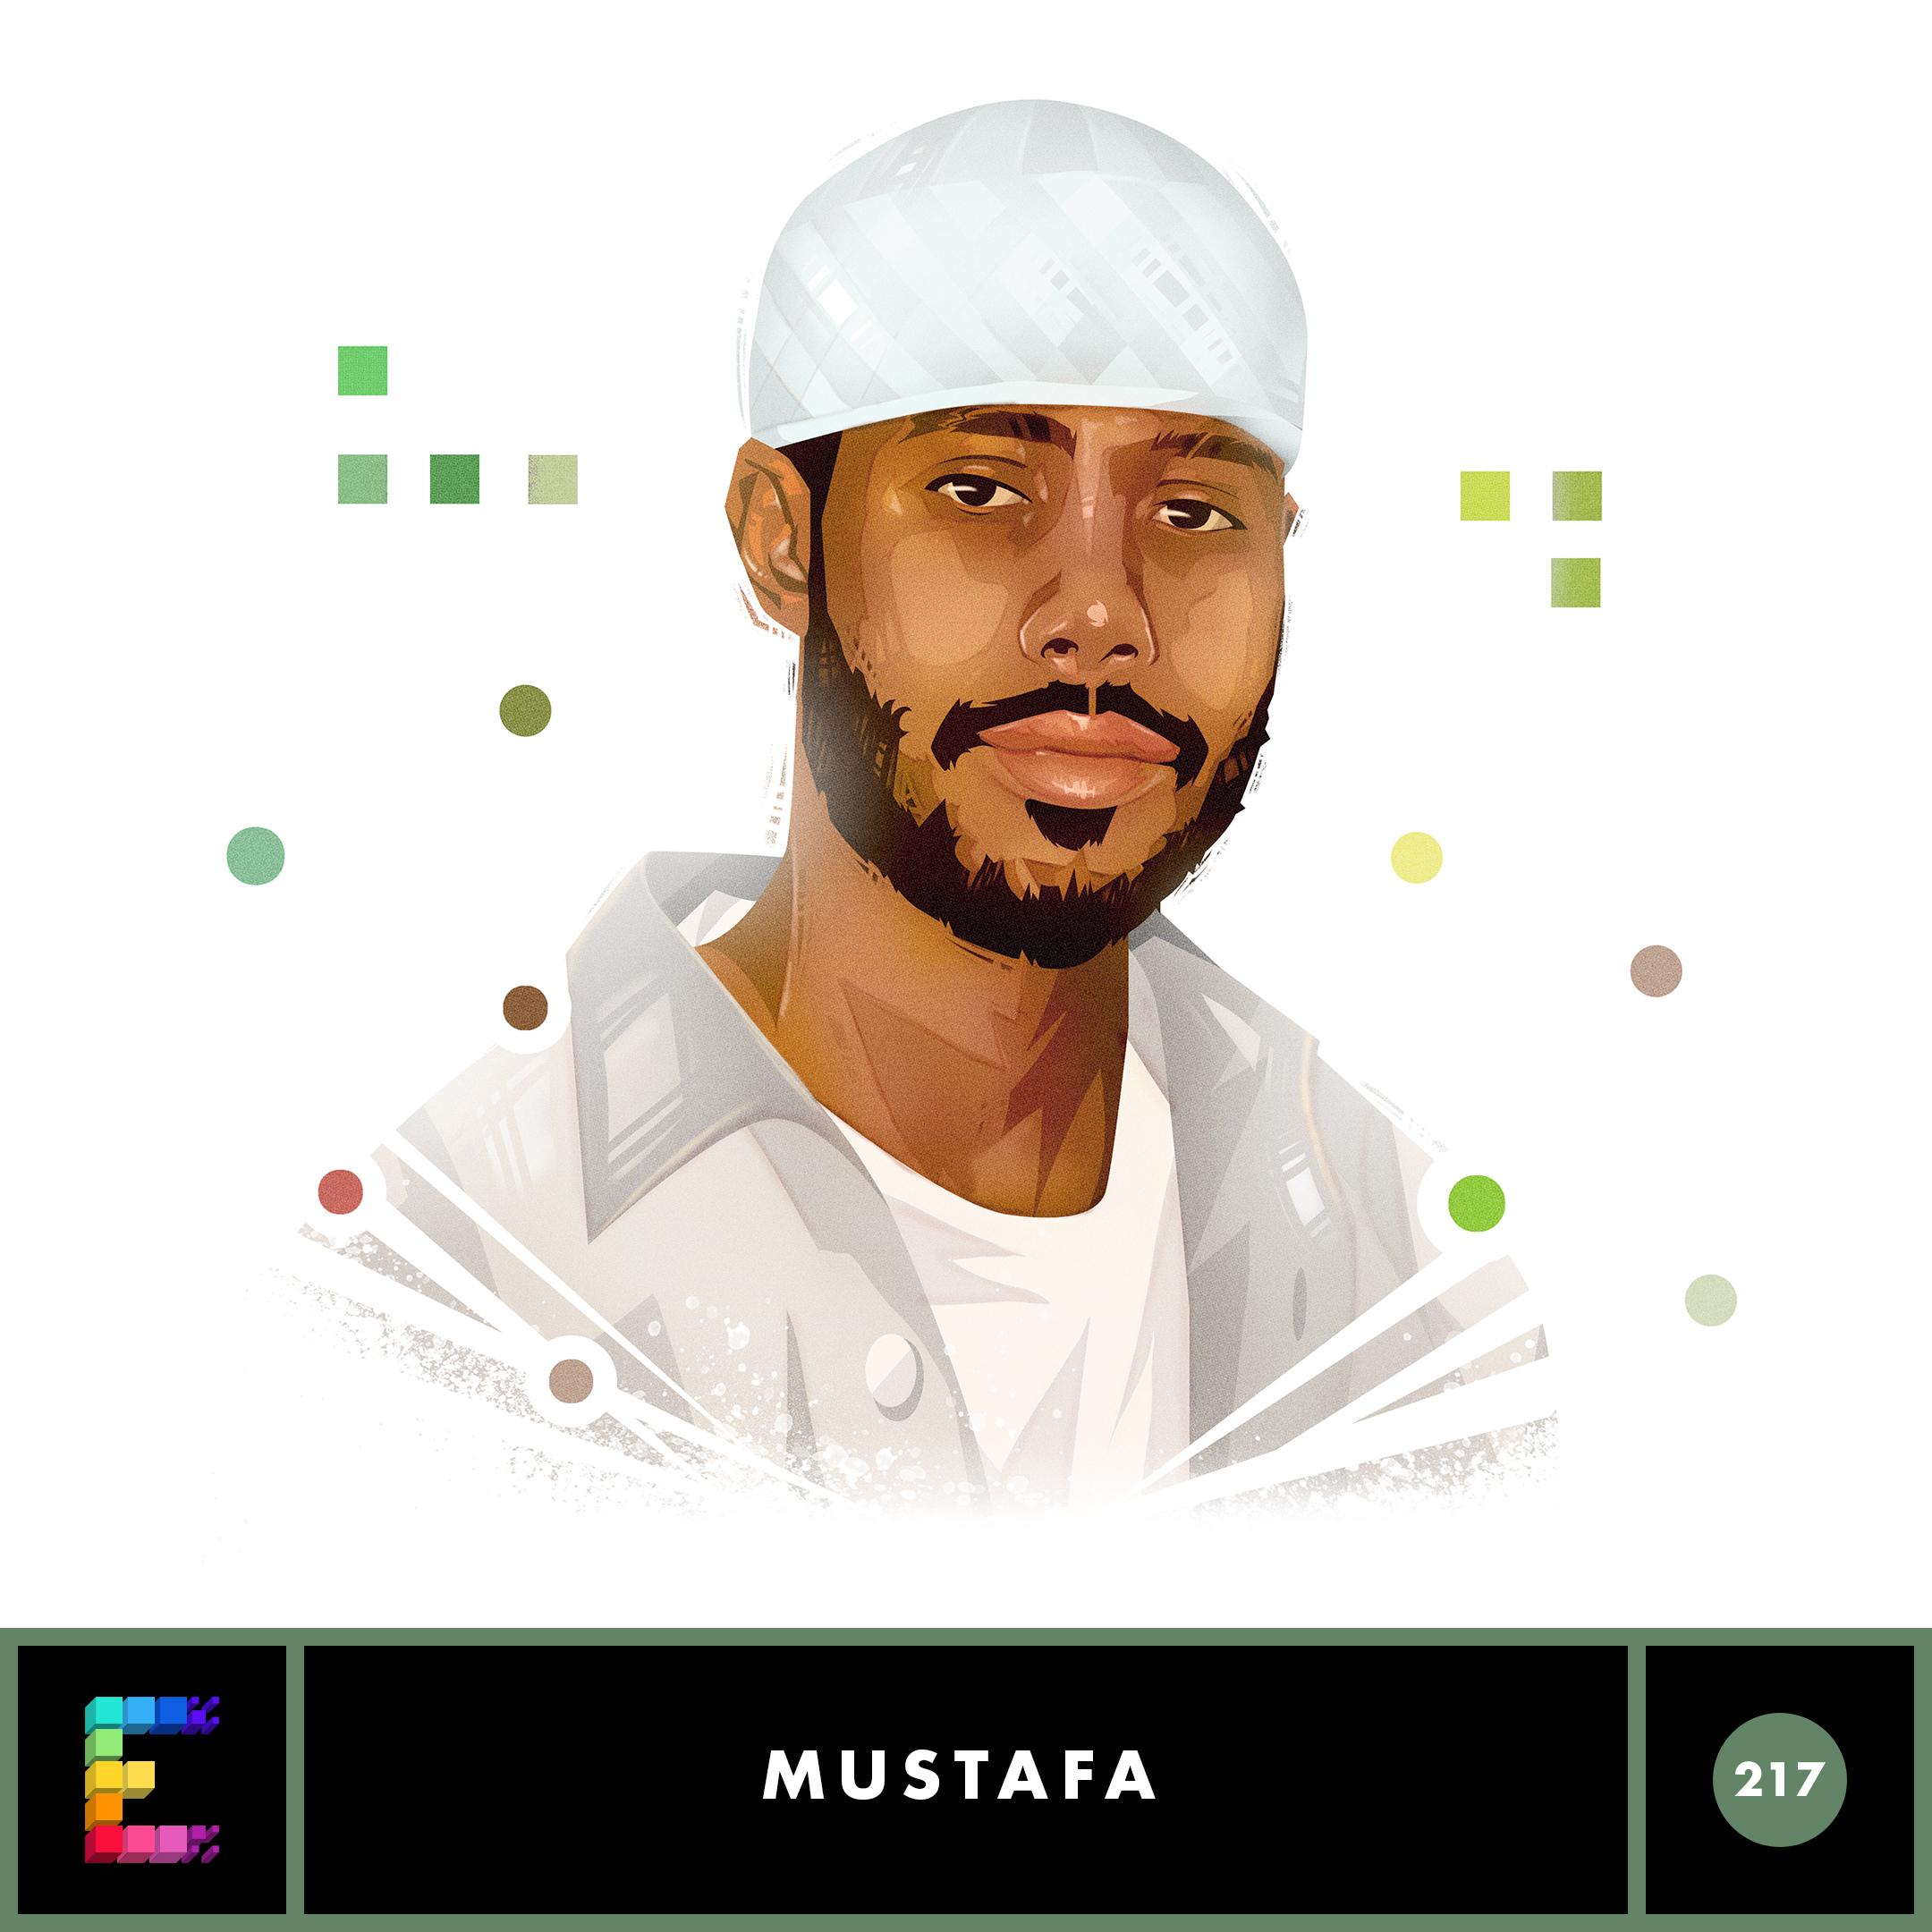 Mustafa - Air Forces